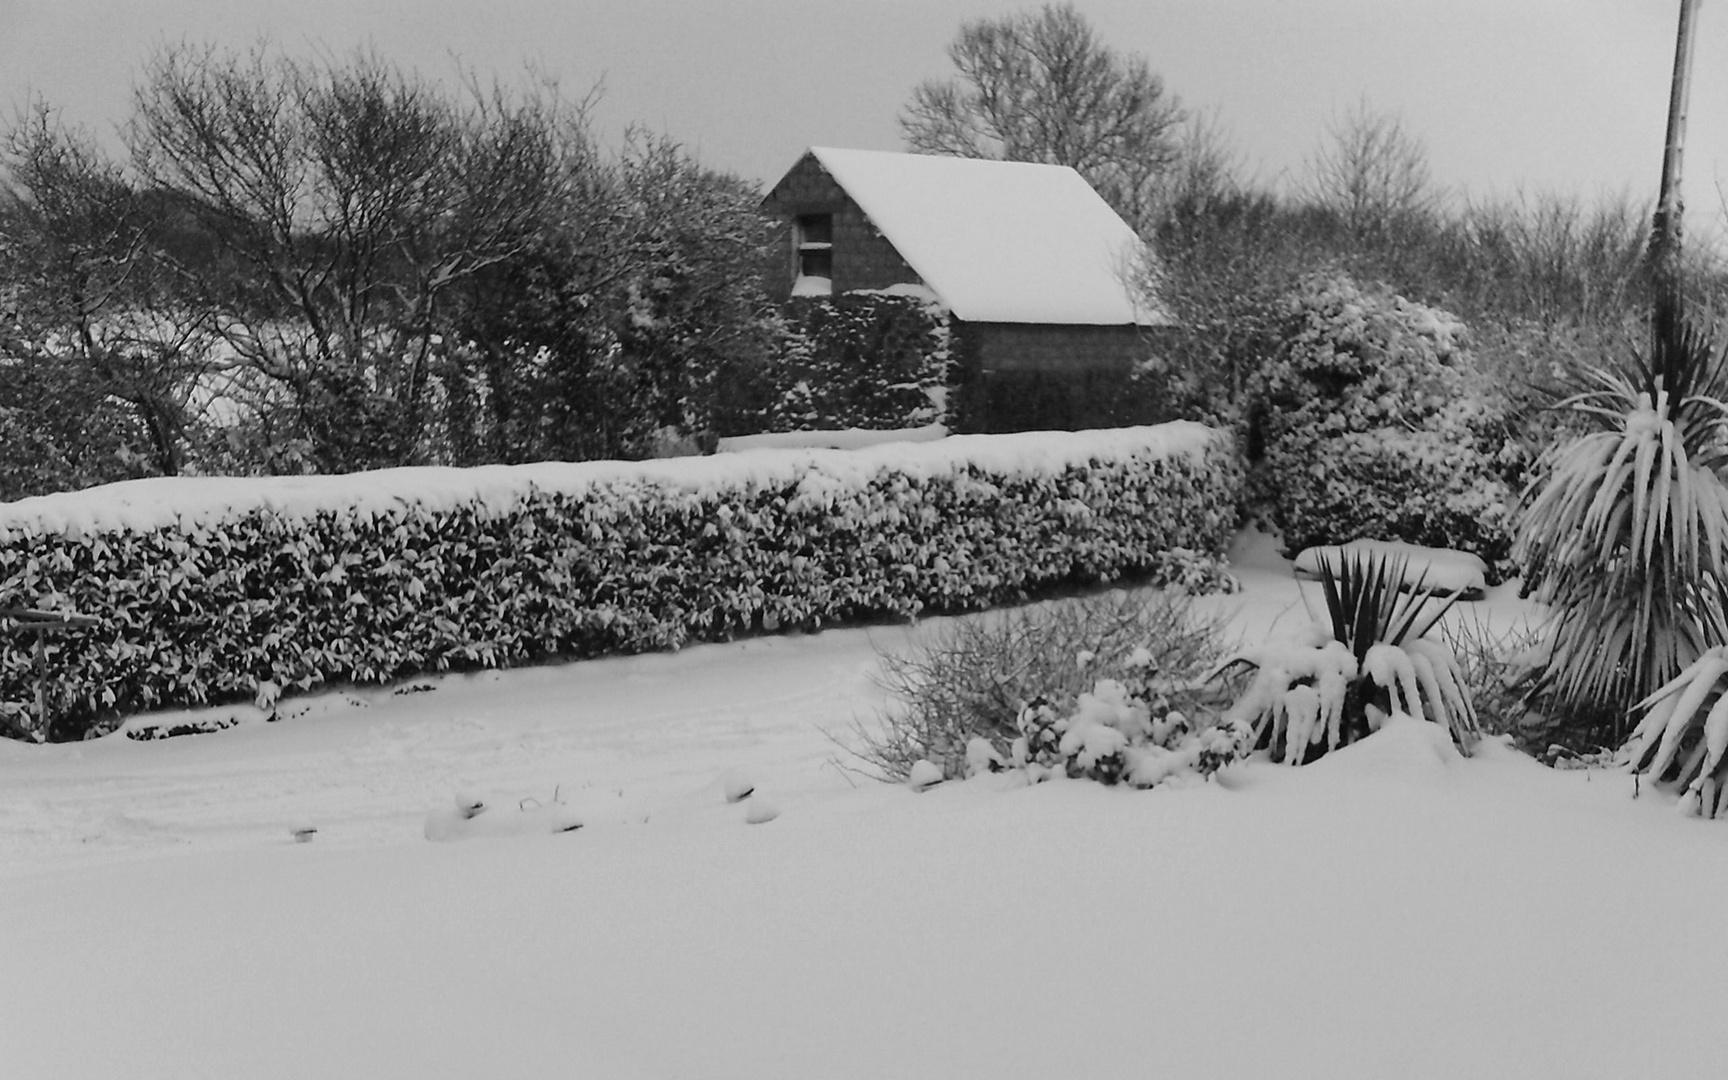 Ma campagne sous la neige ;)